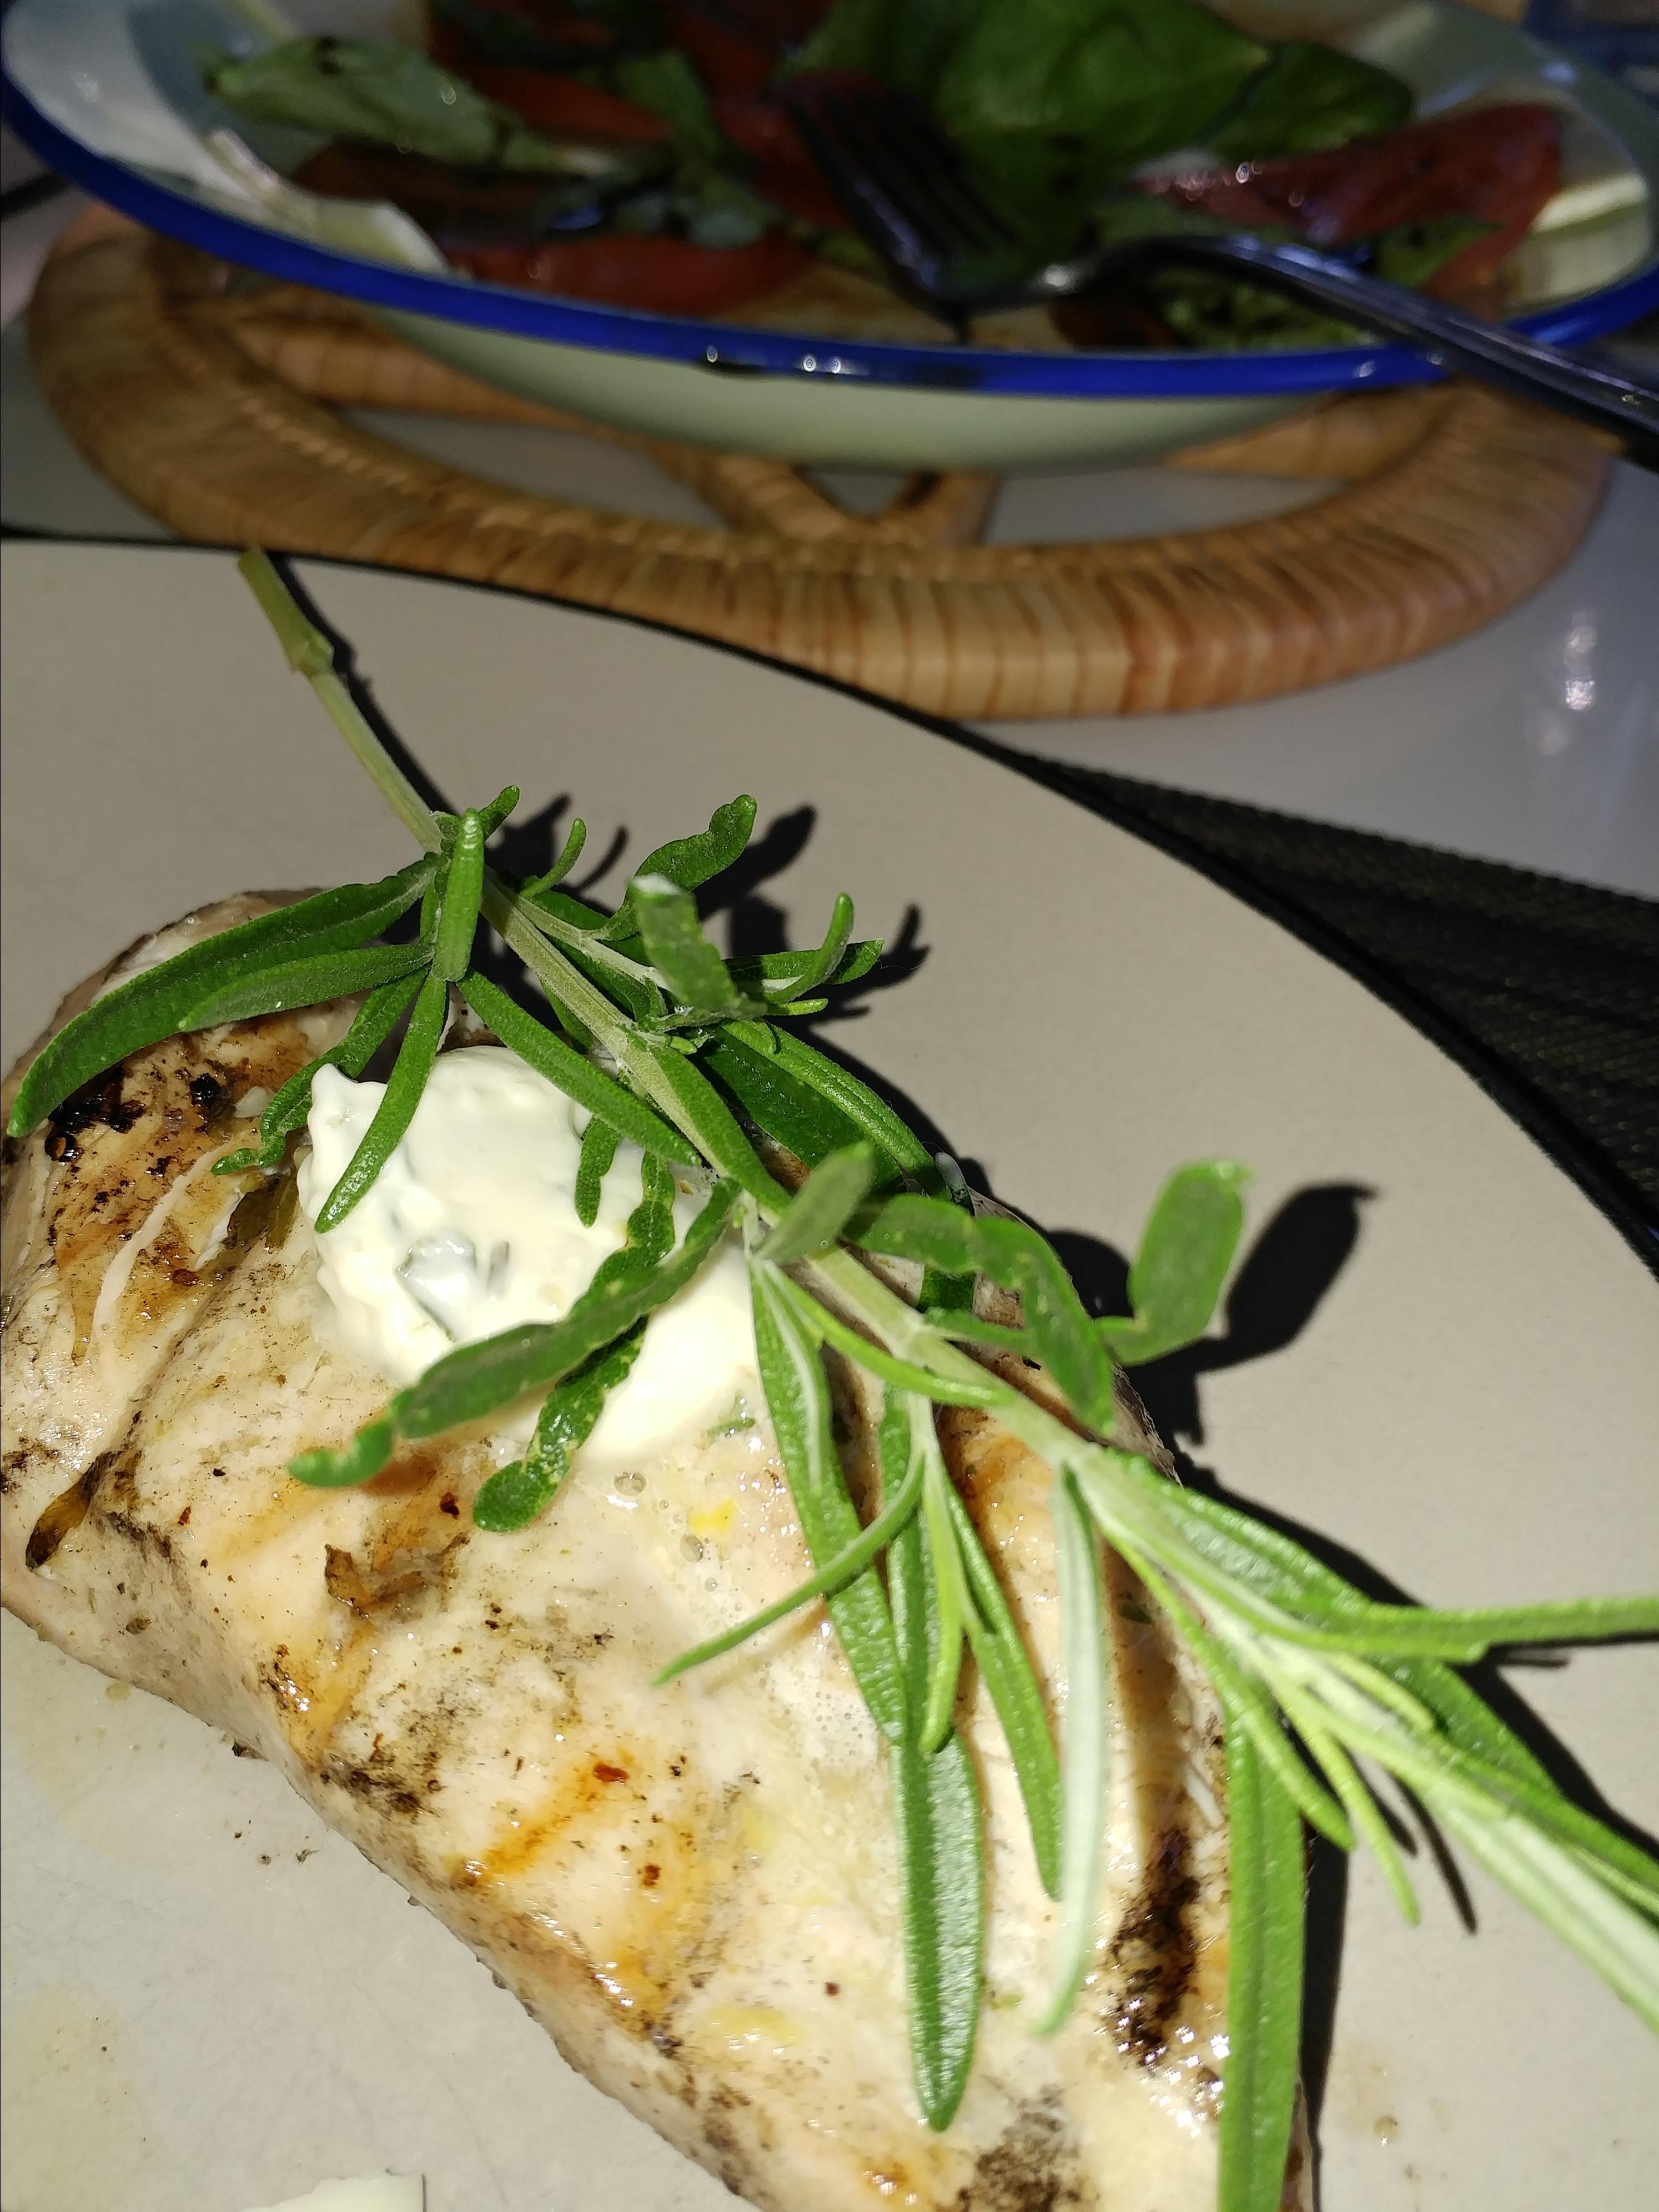 Rosemary Lemon Grilled Chicken Cathy C